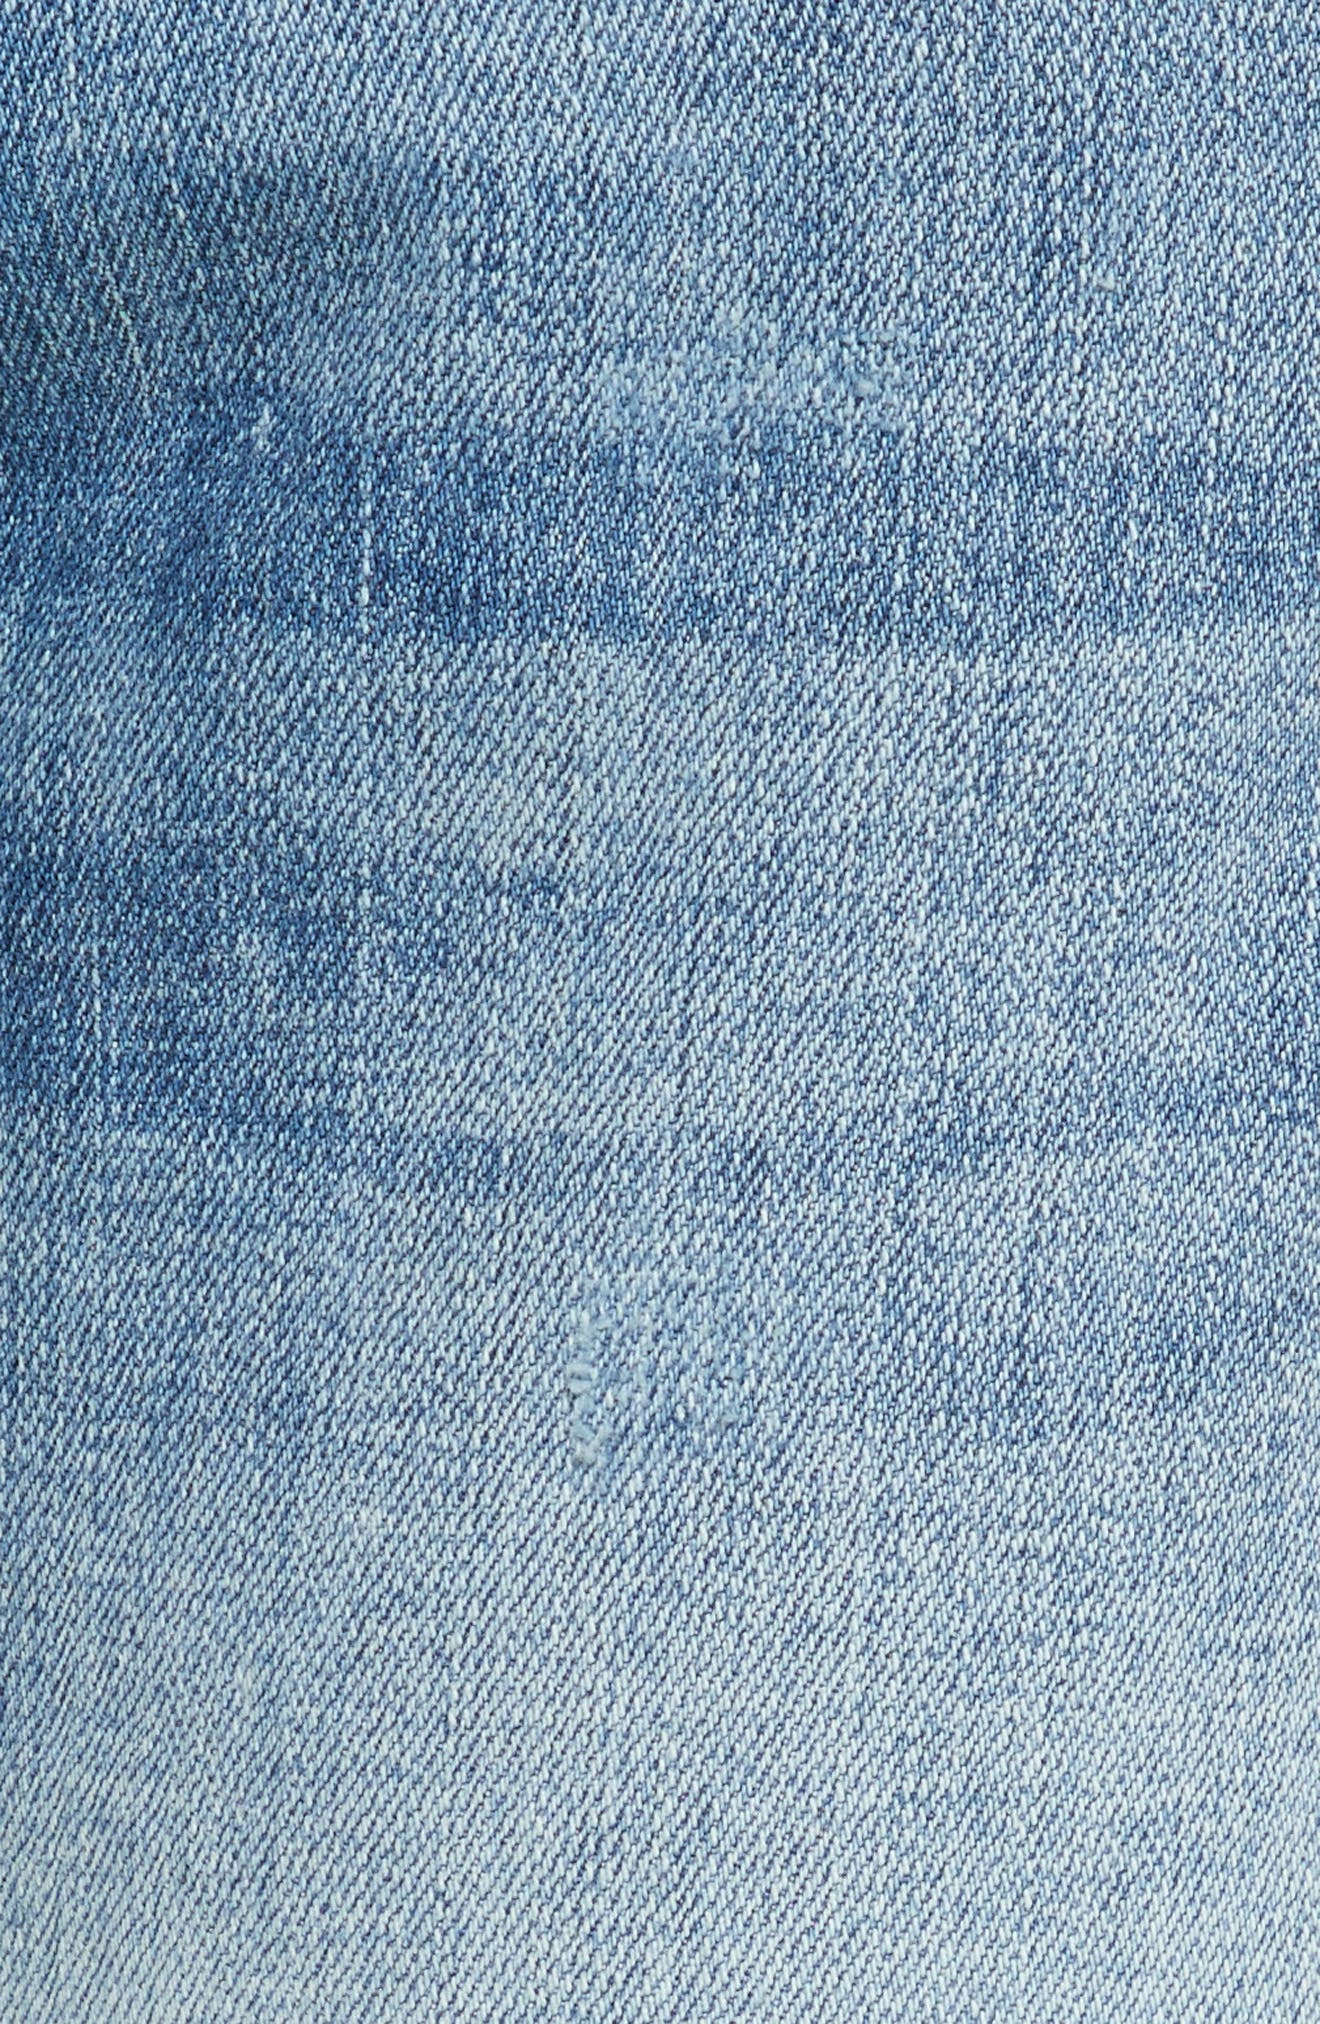 Alternate Image 5  - rag & bone/JEAN The Dre Slim Boyfriend Jeans (June)